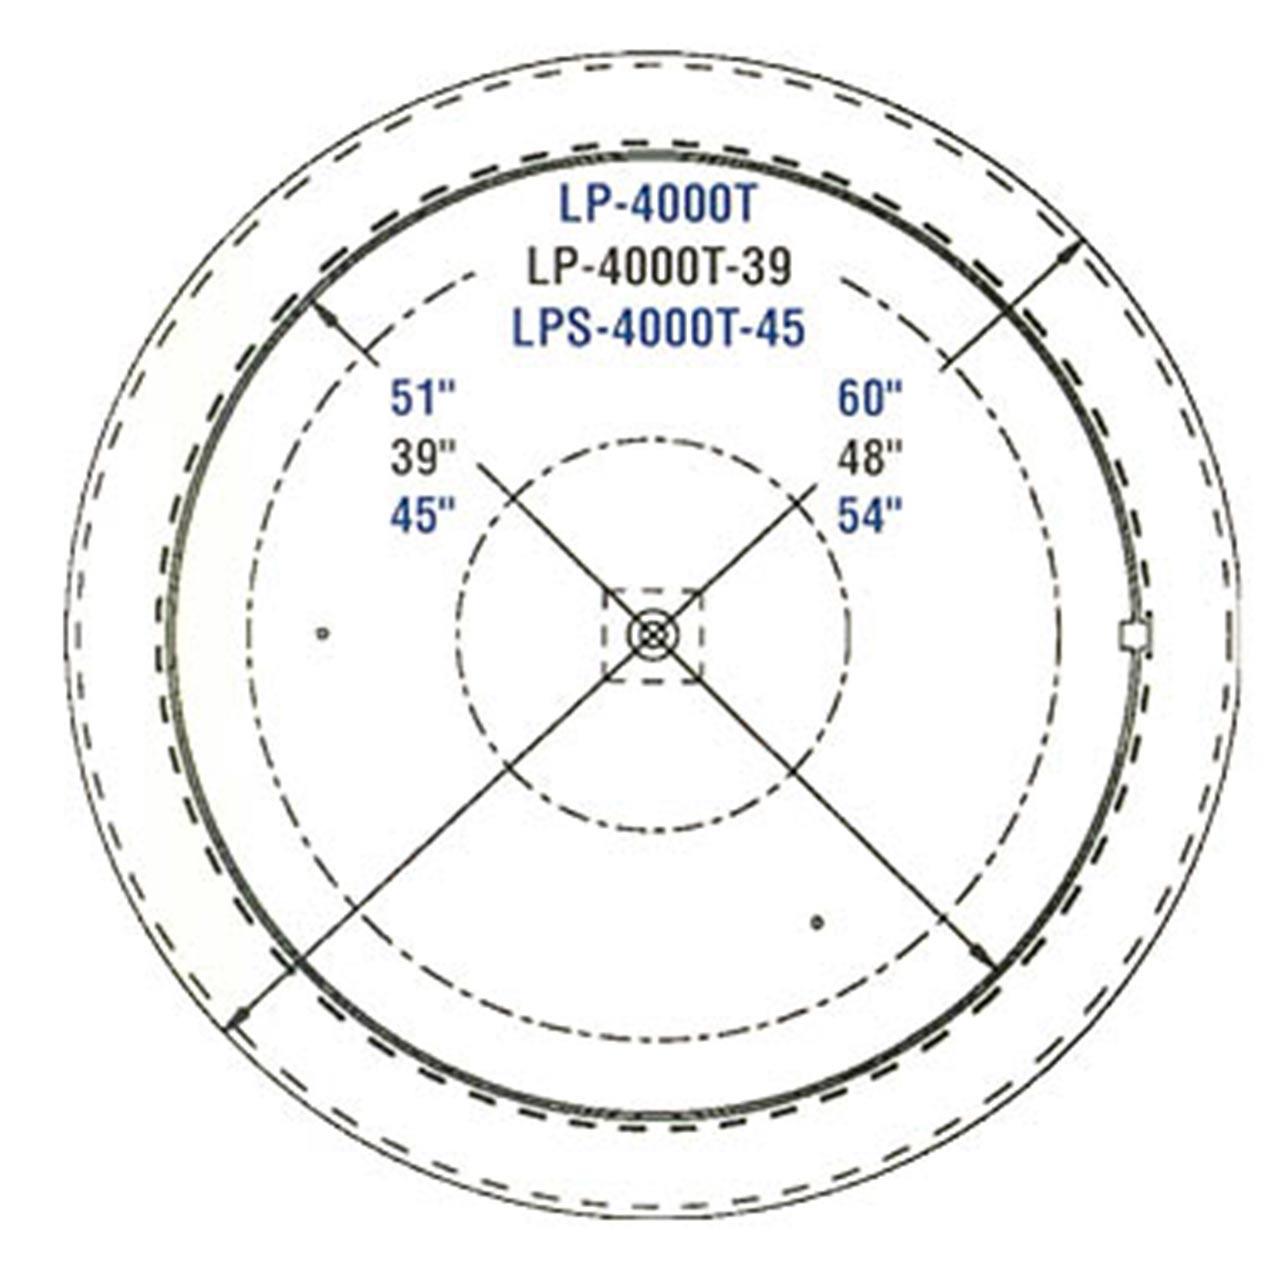 Thin Spin Pallet Carousel Diagram